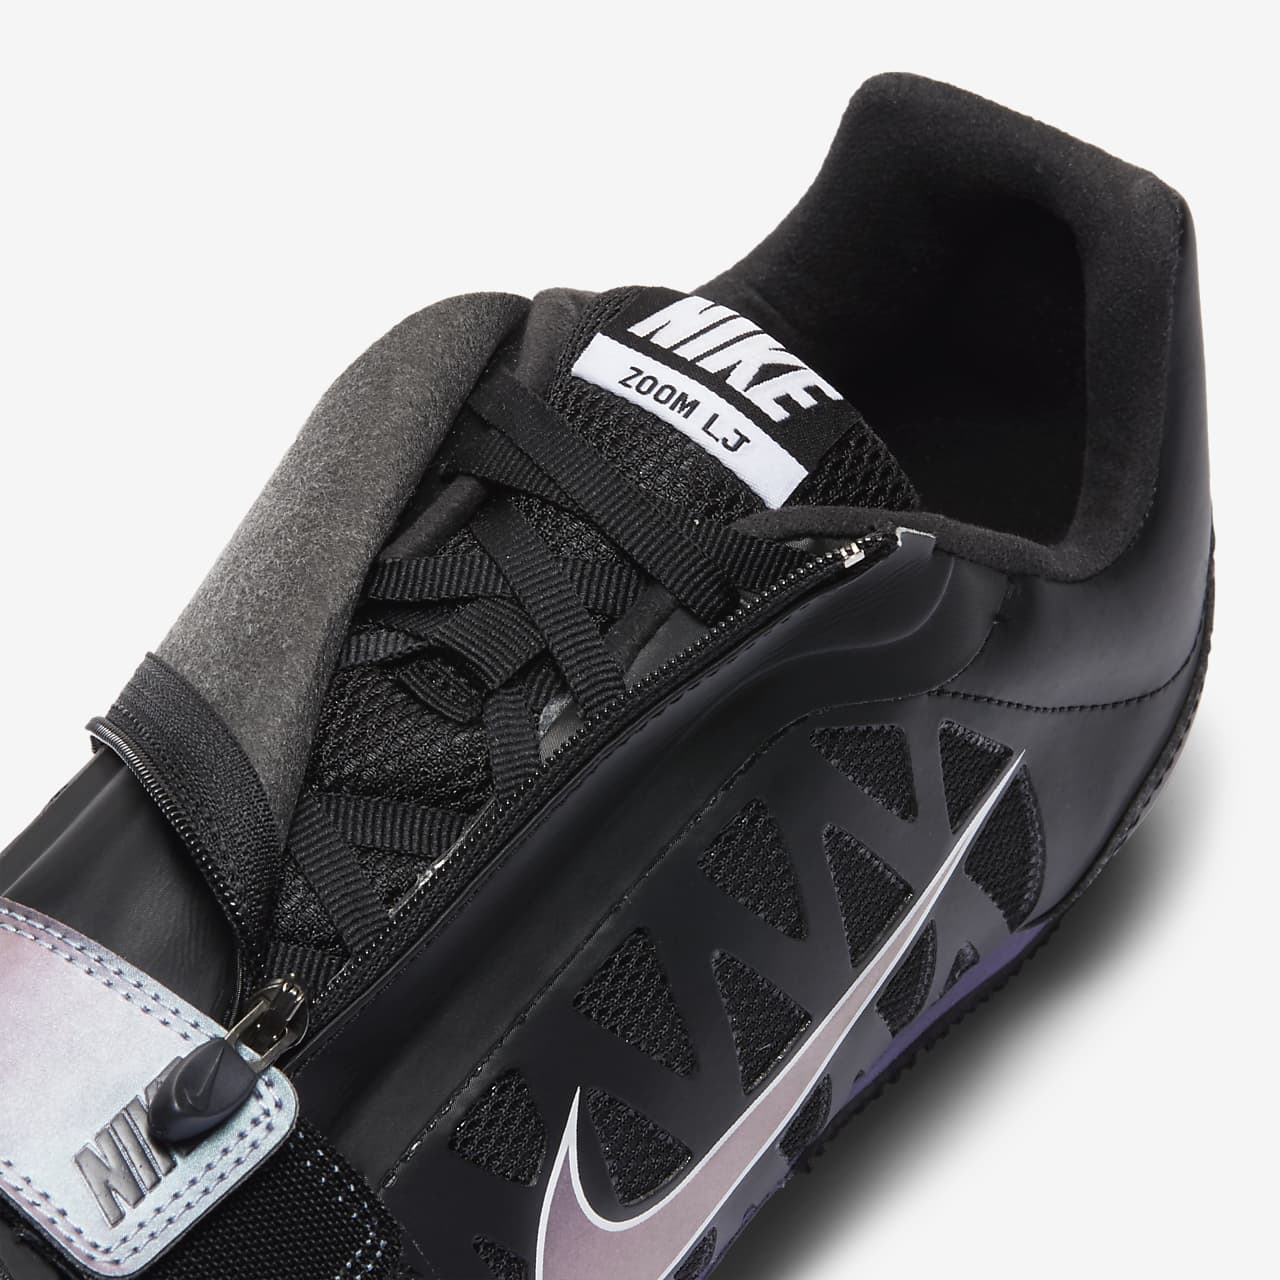 Nike Zoom LJ 4 uniszex ugró szöges cipő. Nike HU